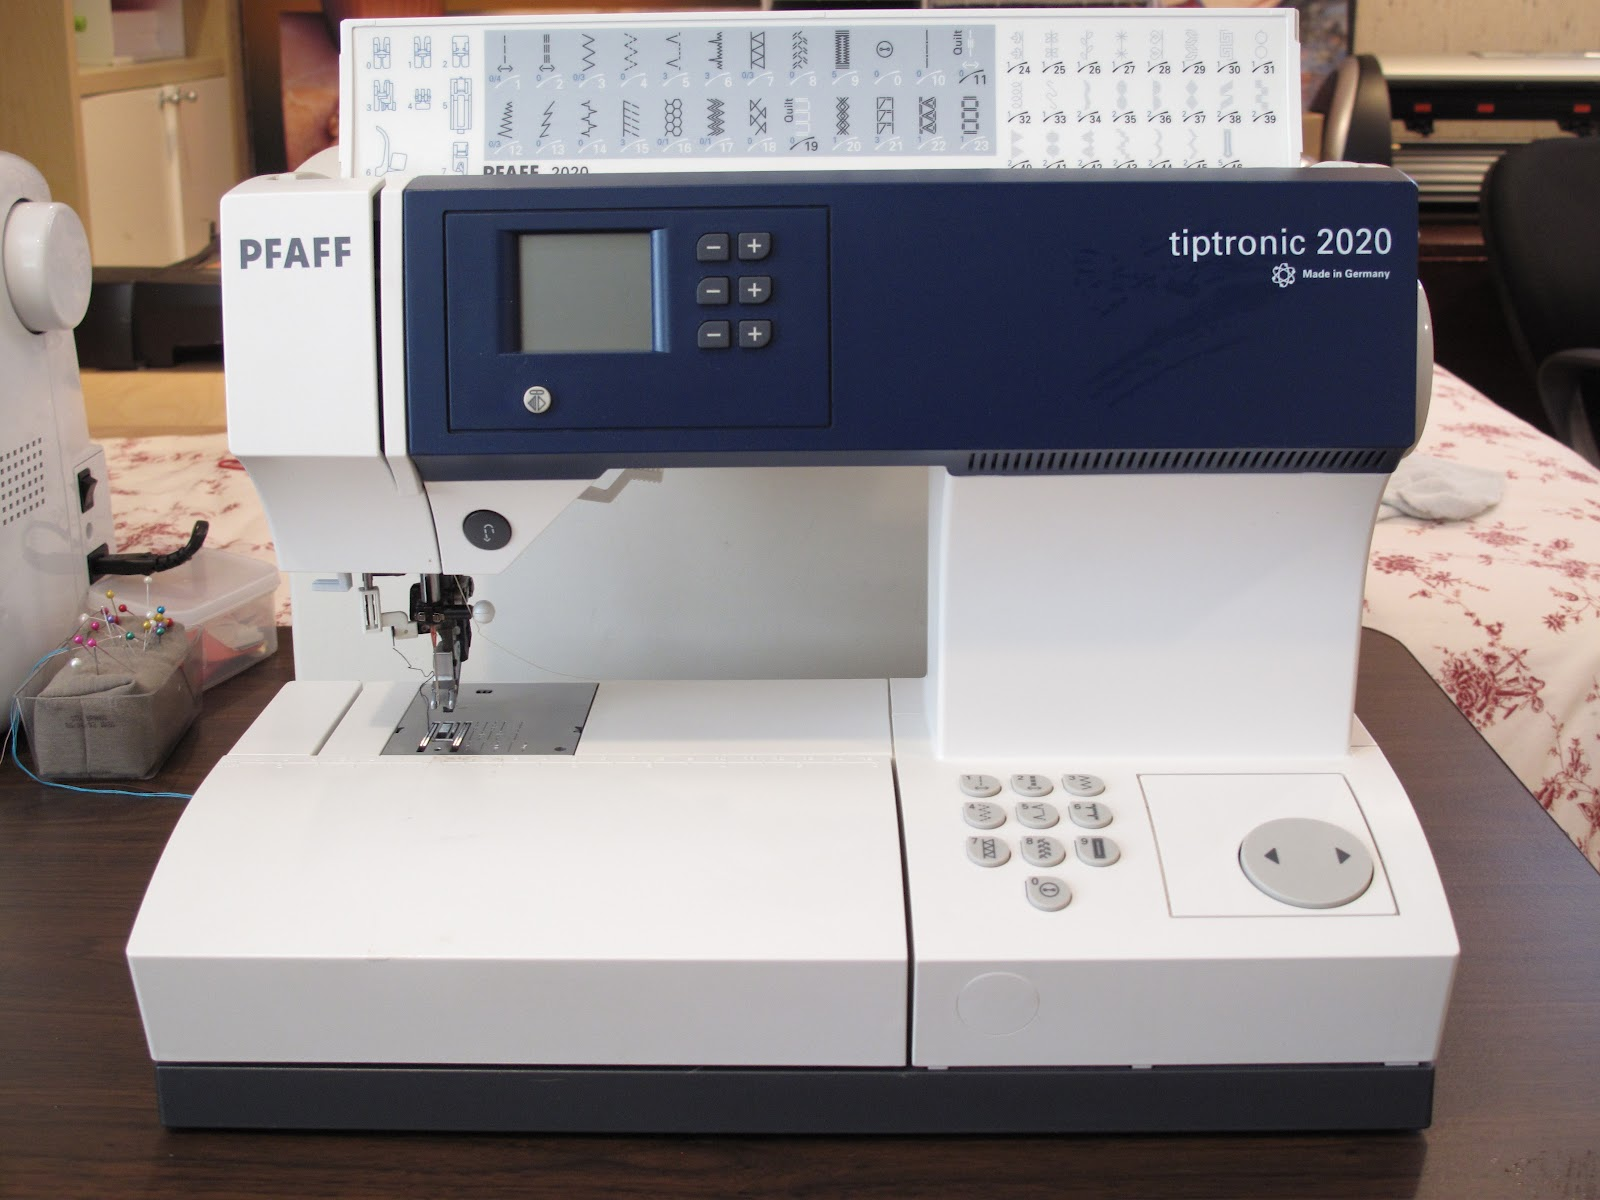 embroidery machine craigslist